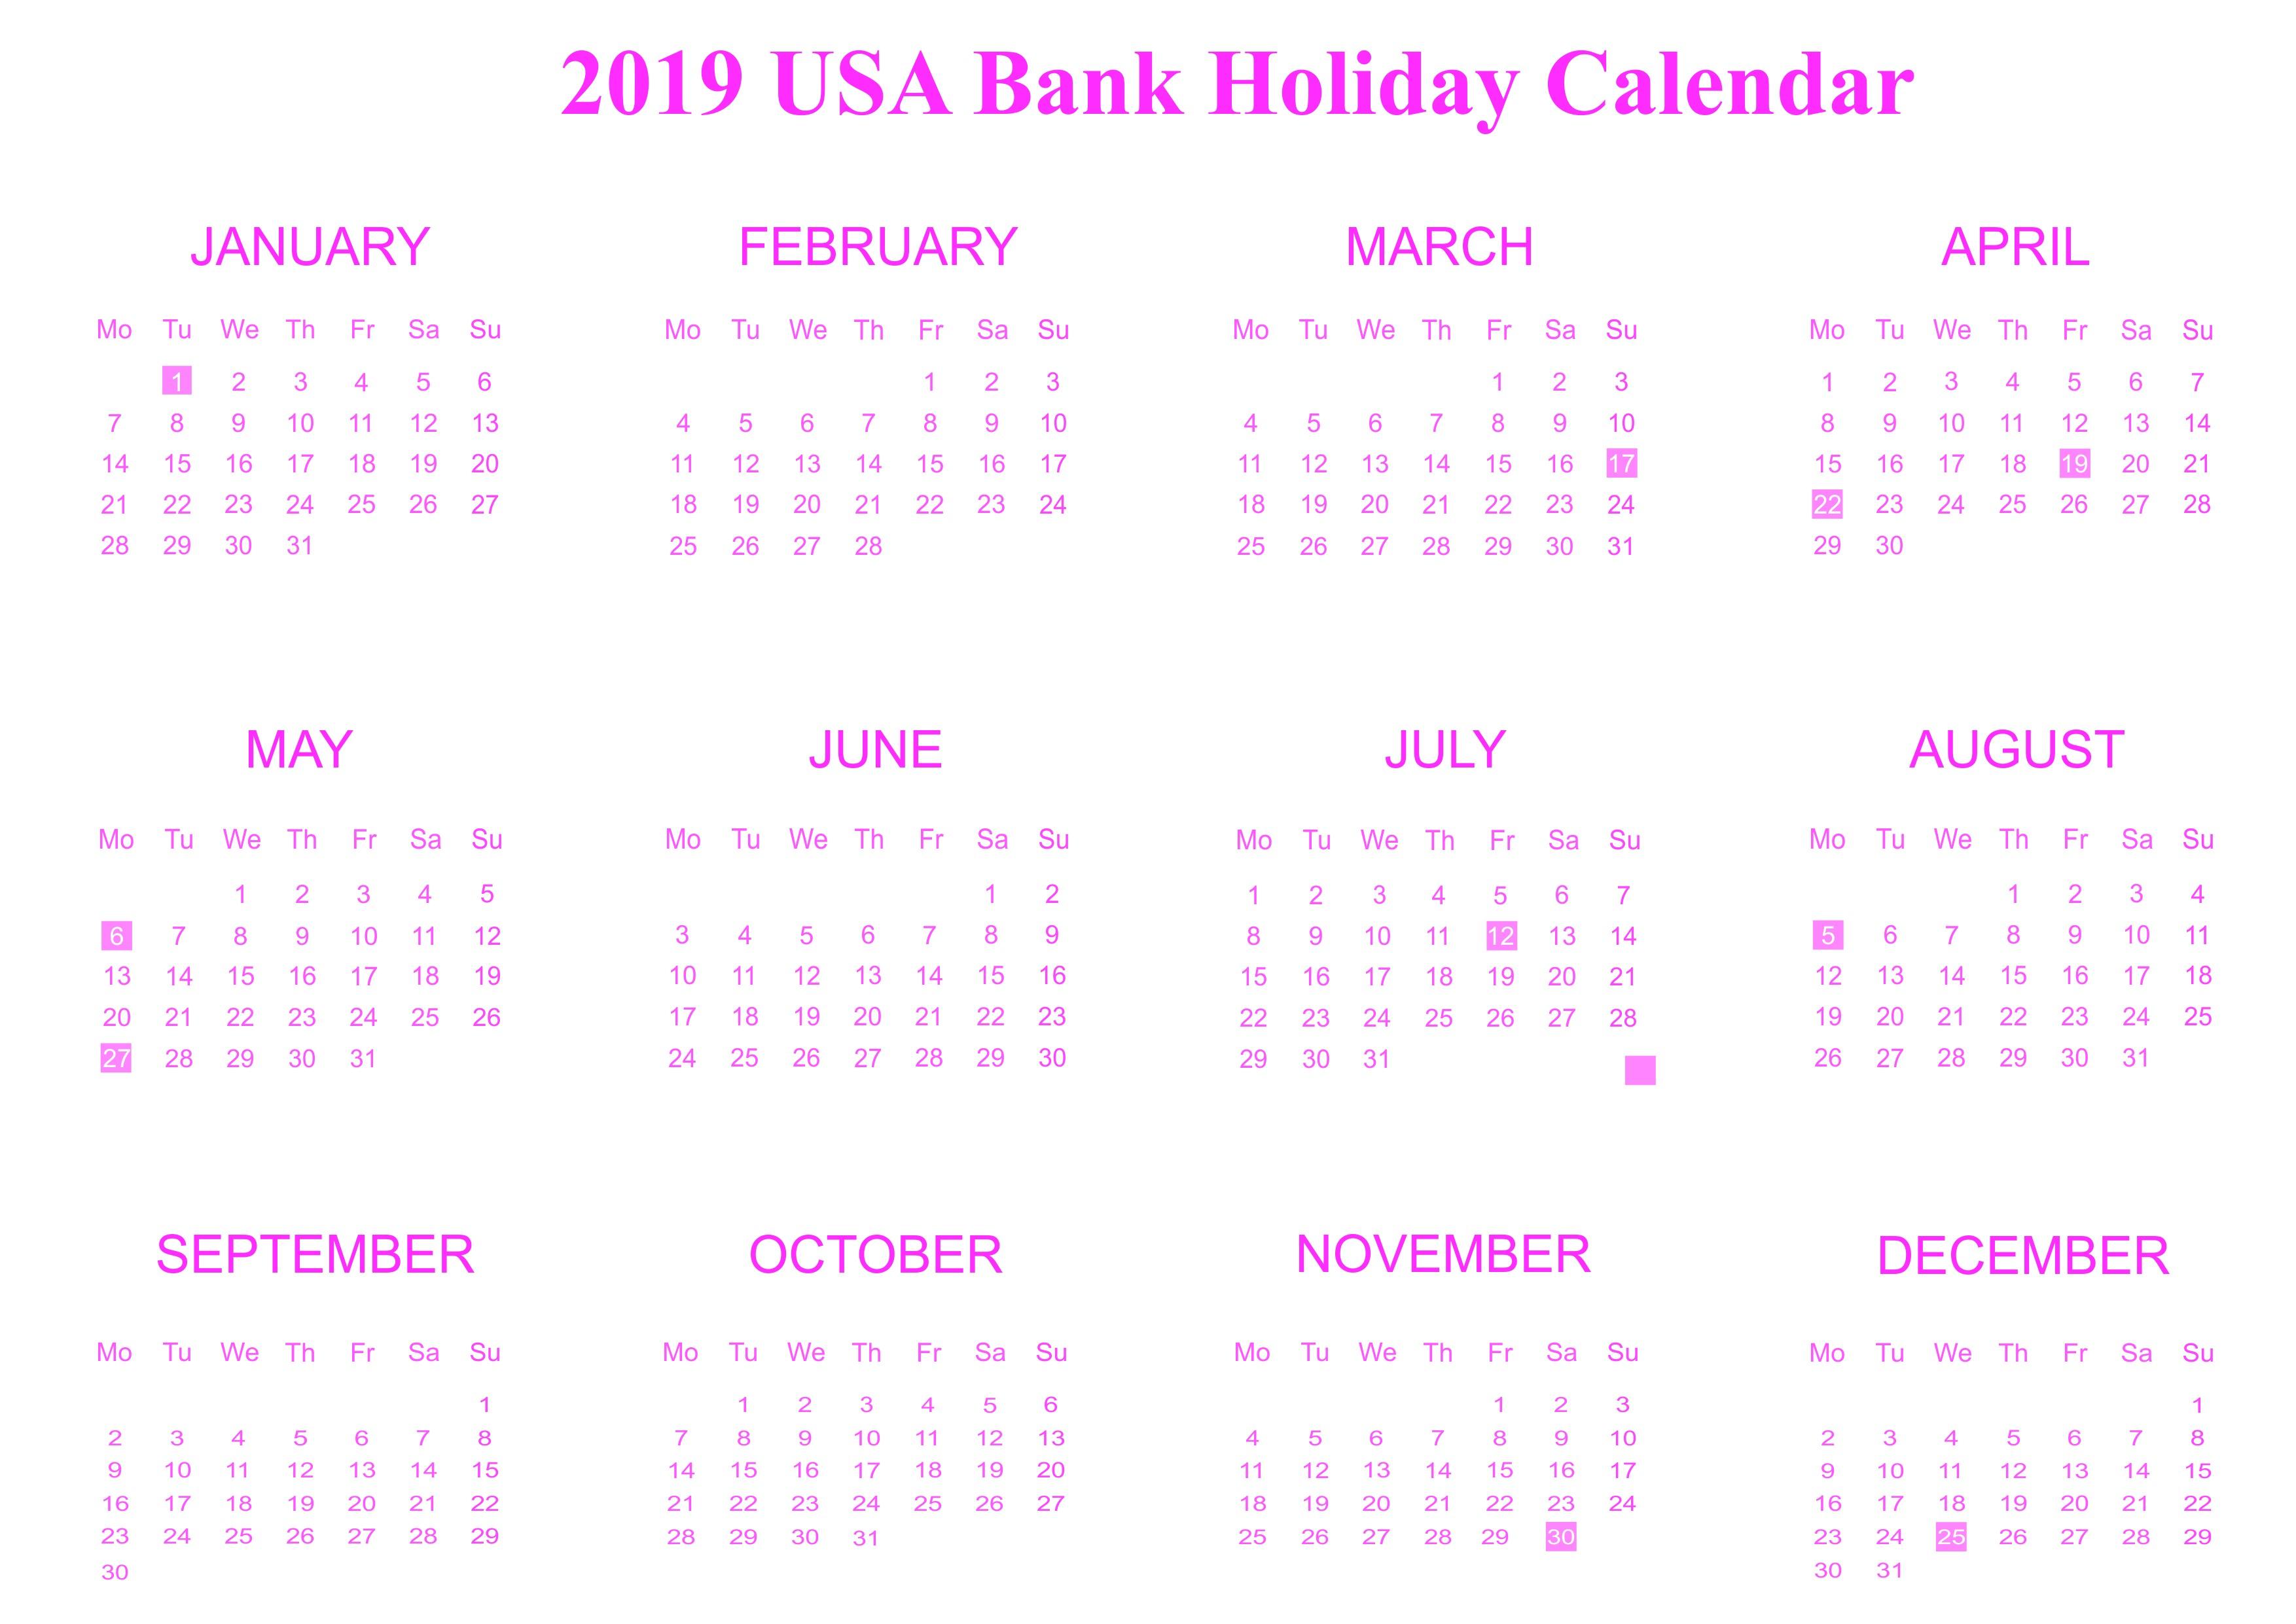 Download Kalender islam 2019 Pdf Más Reciente Download Free Bank Holiday 2019 Usa Calendar Templates [pdf Of Download Kalender islam 2019 Pdf Actual Get Free Printable January 2019 Calendar with Holidays